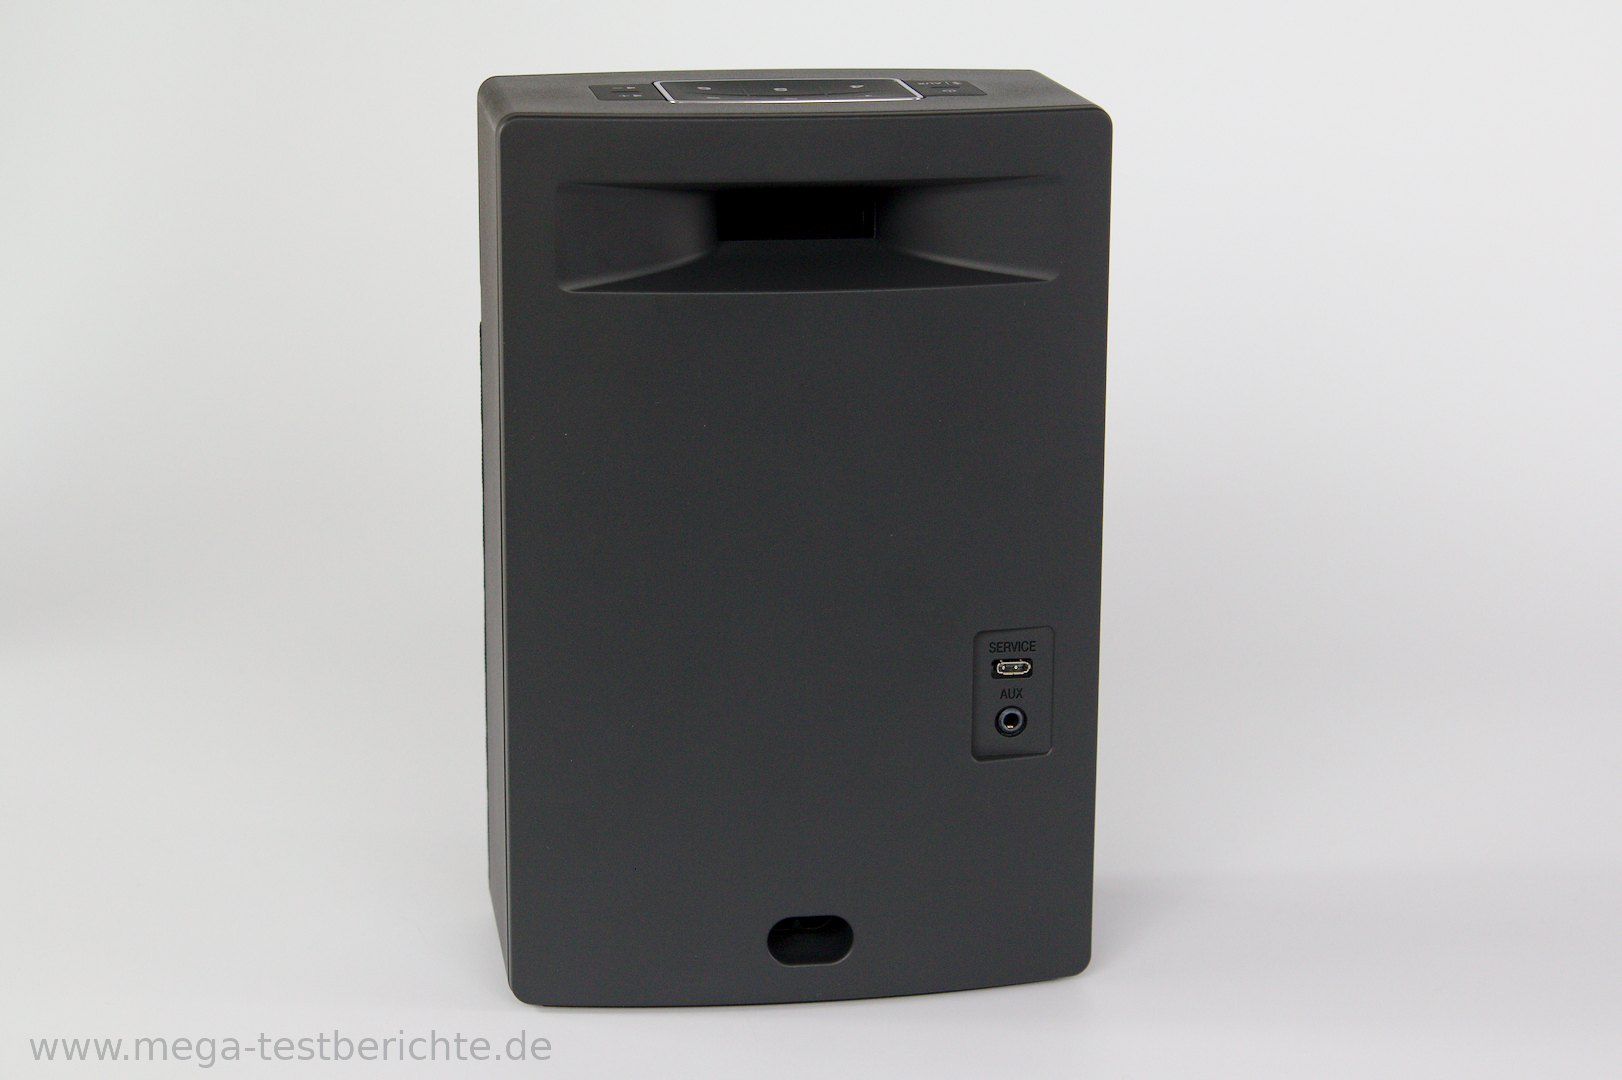 bose soundtouch 10 im test bluetooth lautsprecher. Black Bedroom Furniture Sets. Home Design Ideas